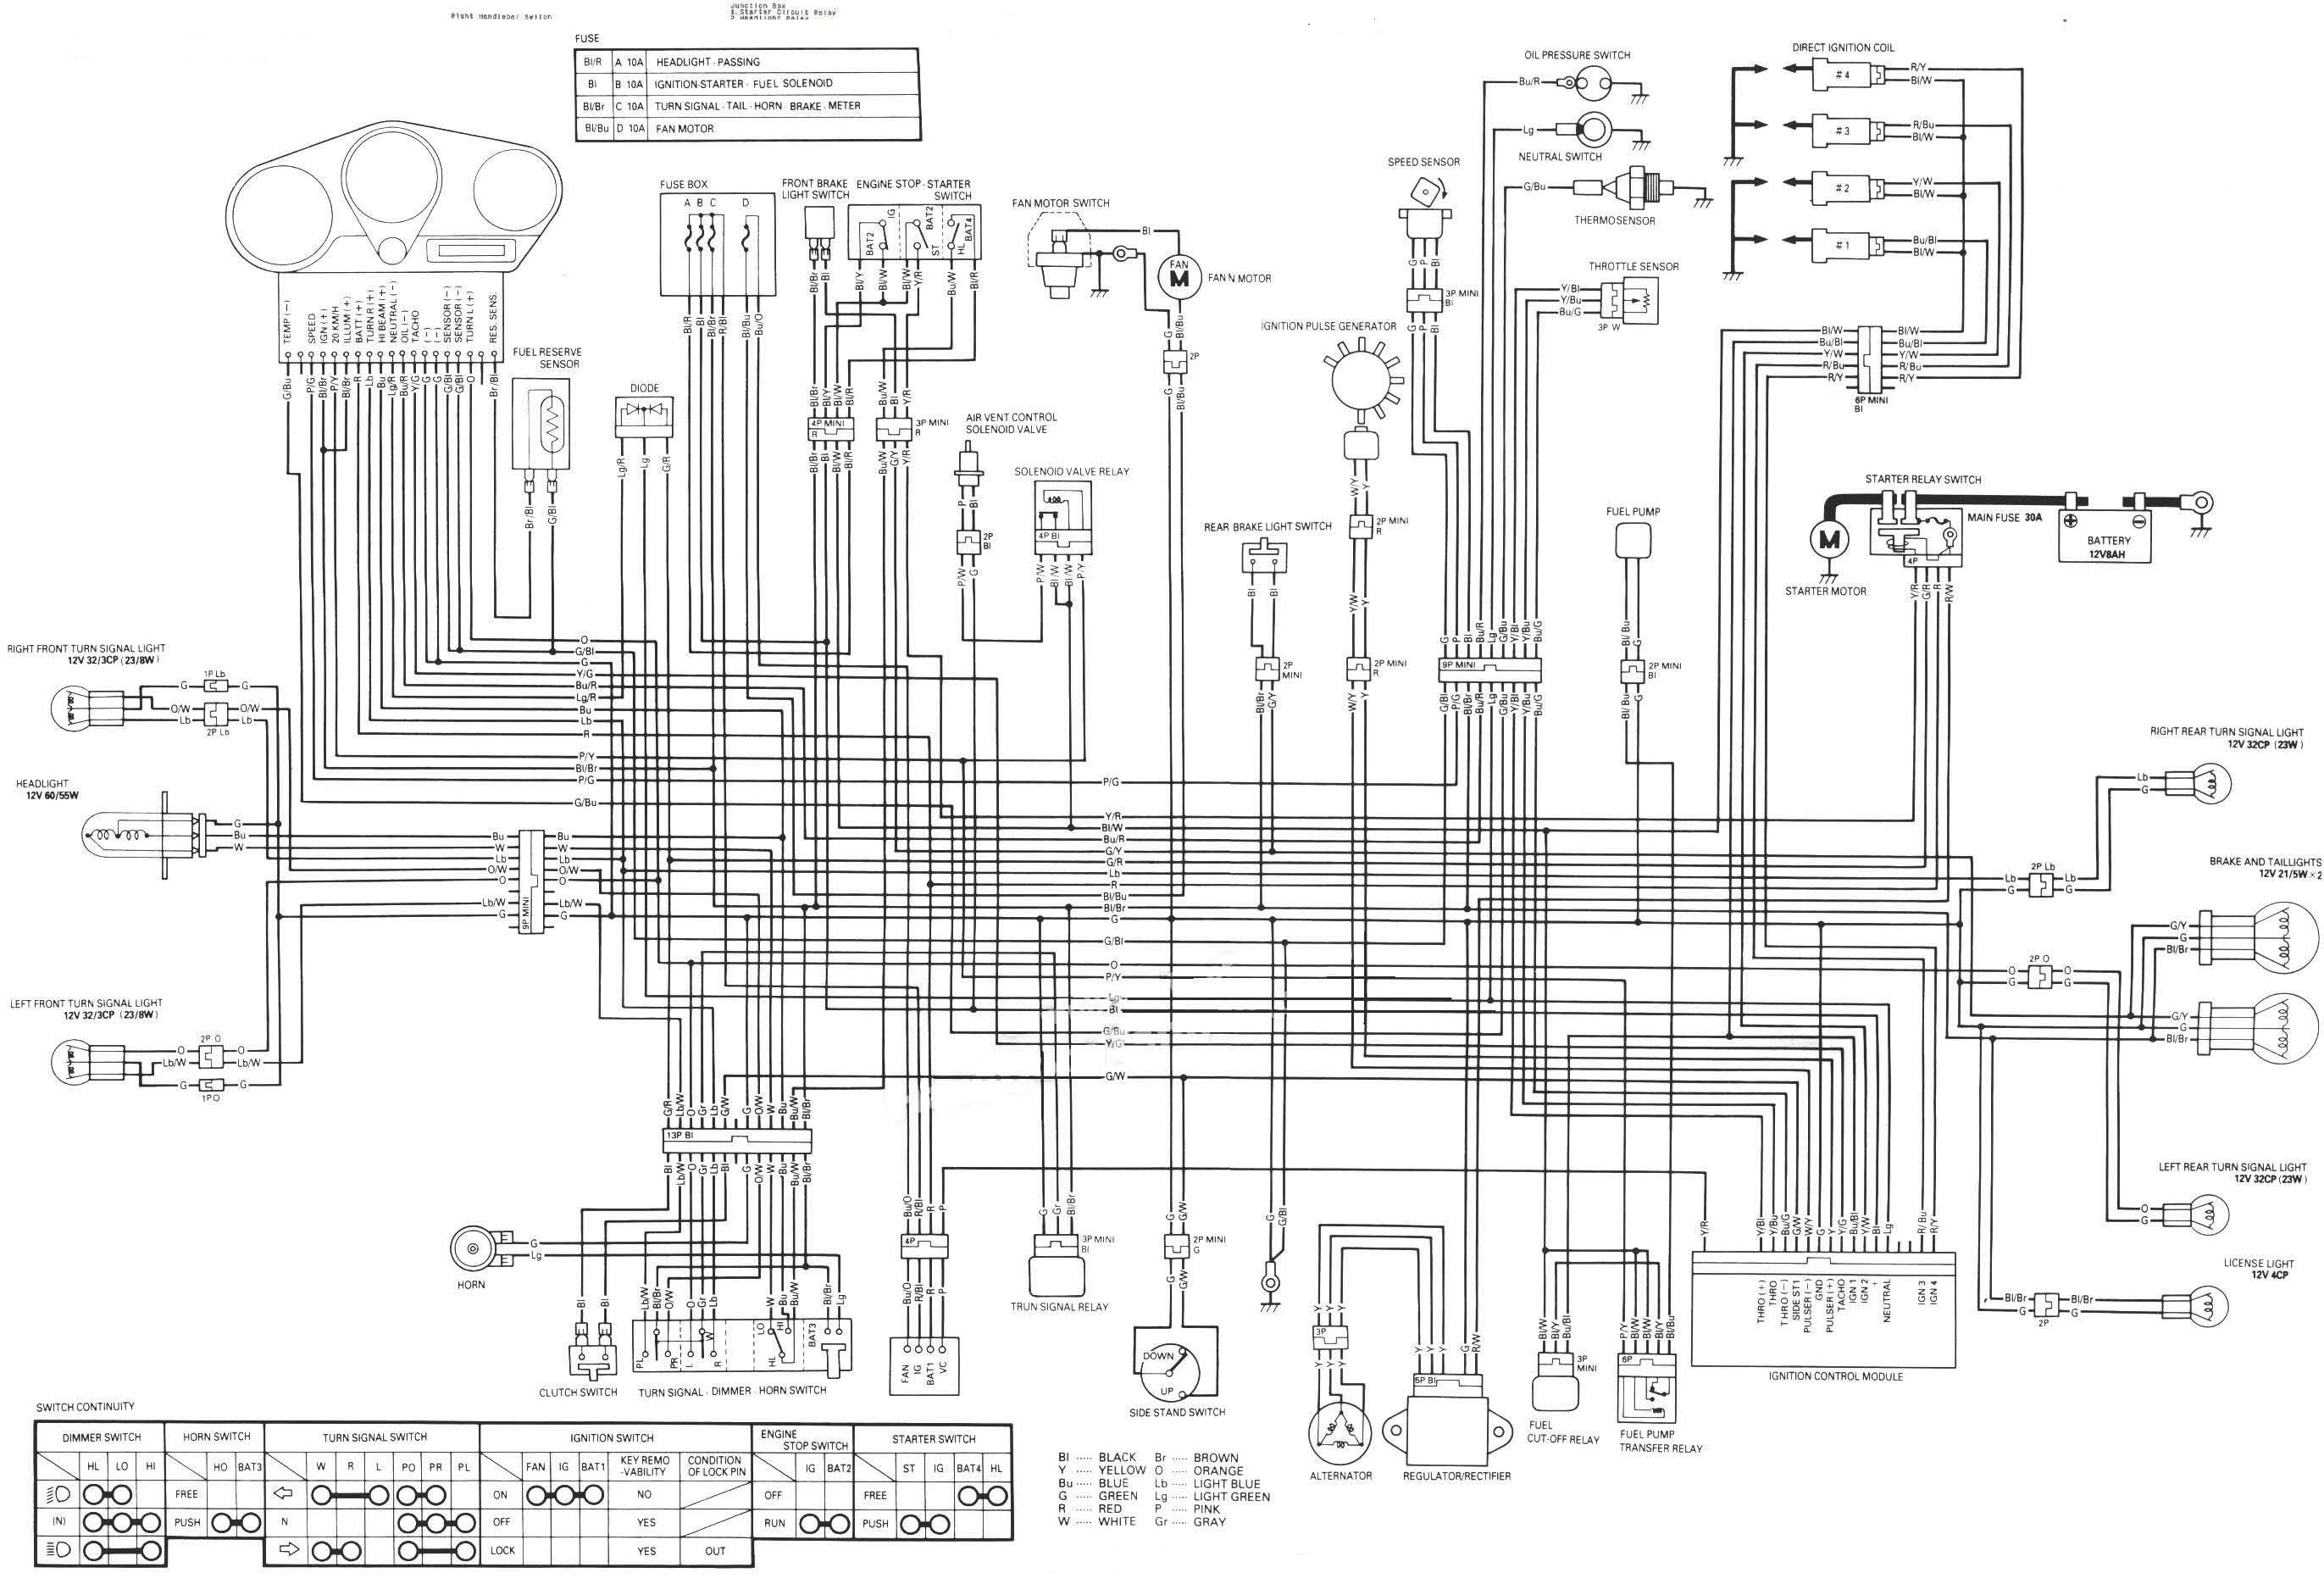 diagram honda cbr f4 1999 wiring file bv643051999 cbr 600f4 wont start cbr 1999 cbr 600f4 wont start cbr 2006 honda cbr600rr wiring diagram